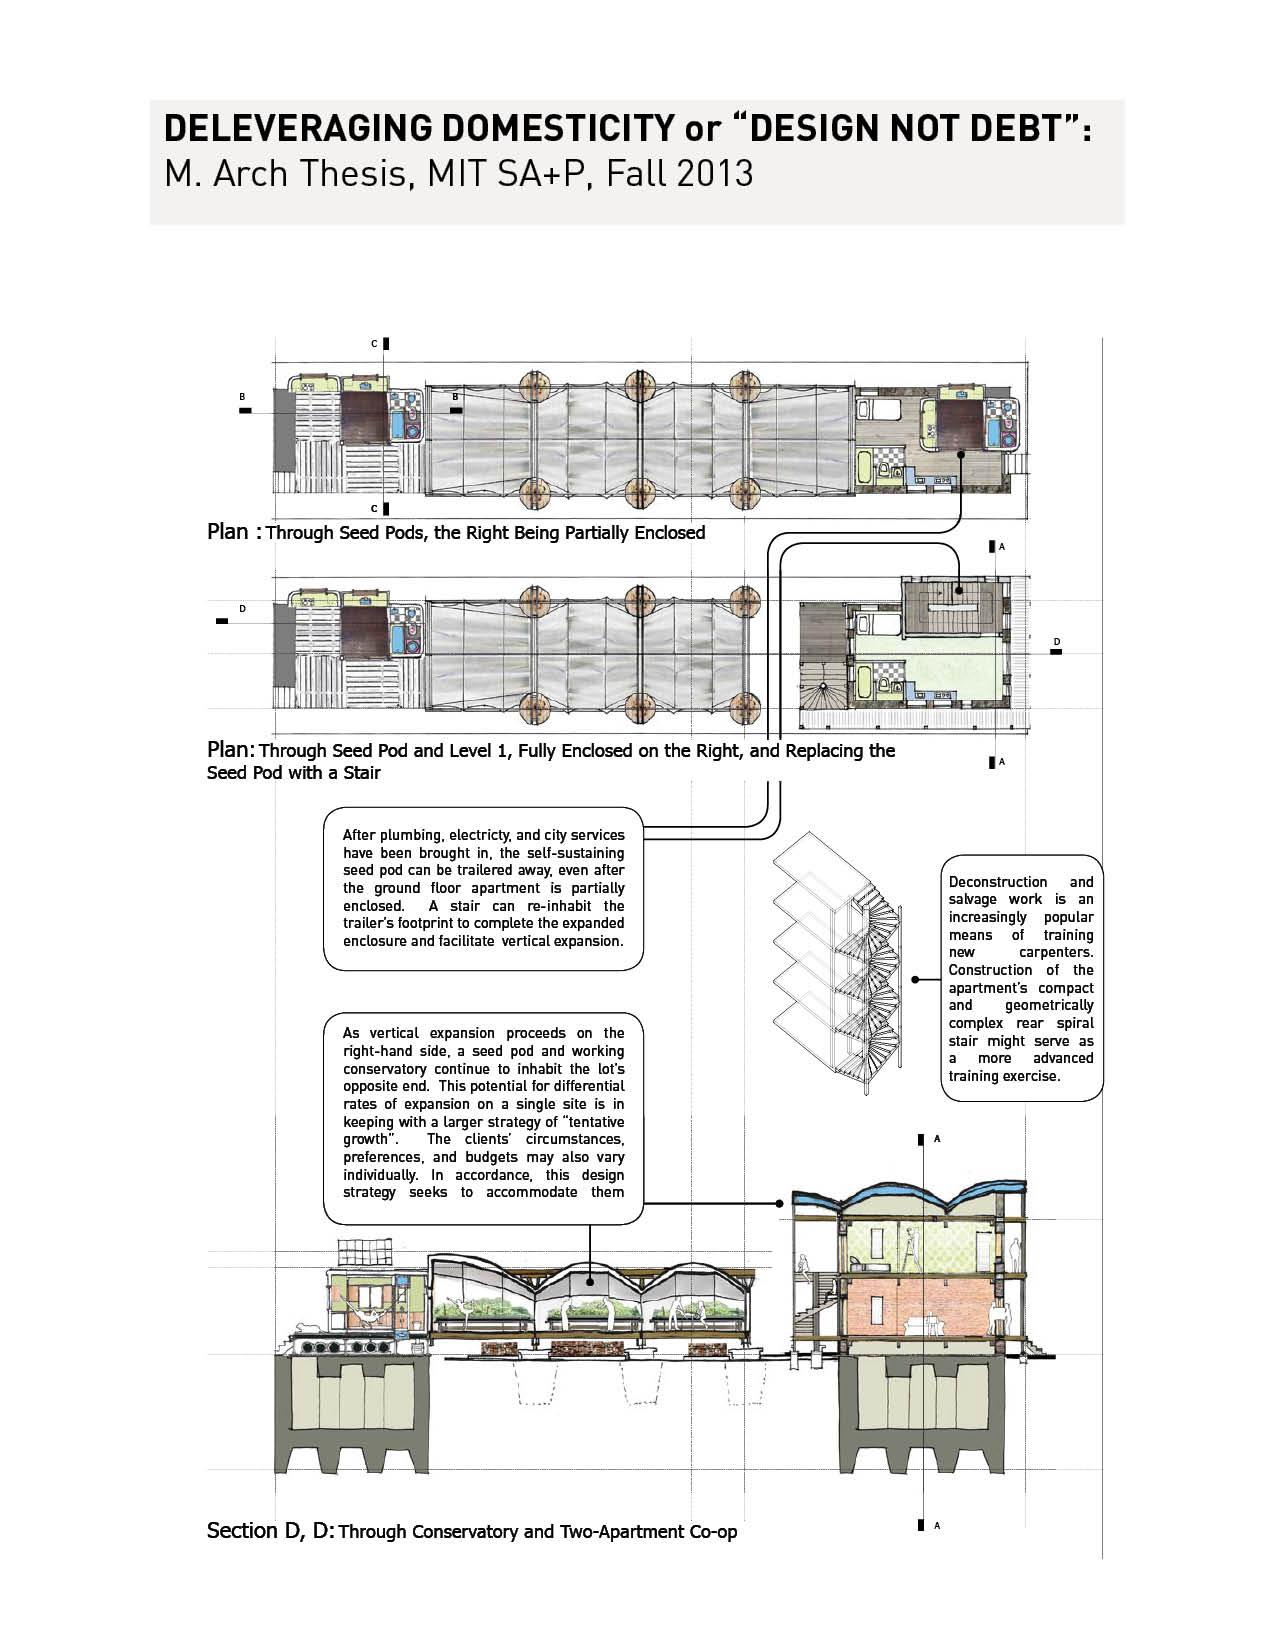 MIT_thesis9.jpg